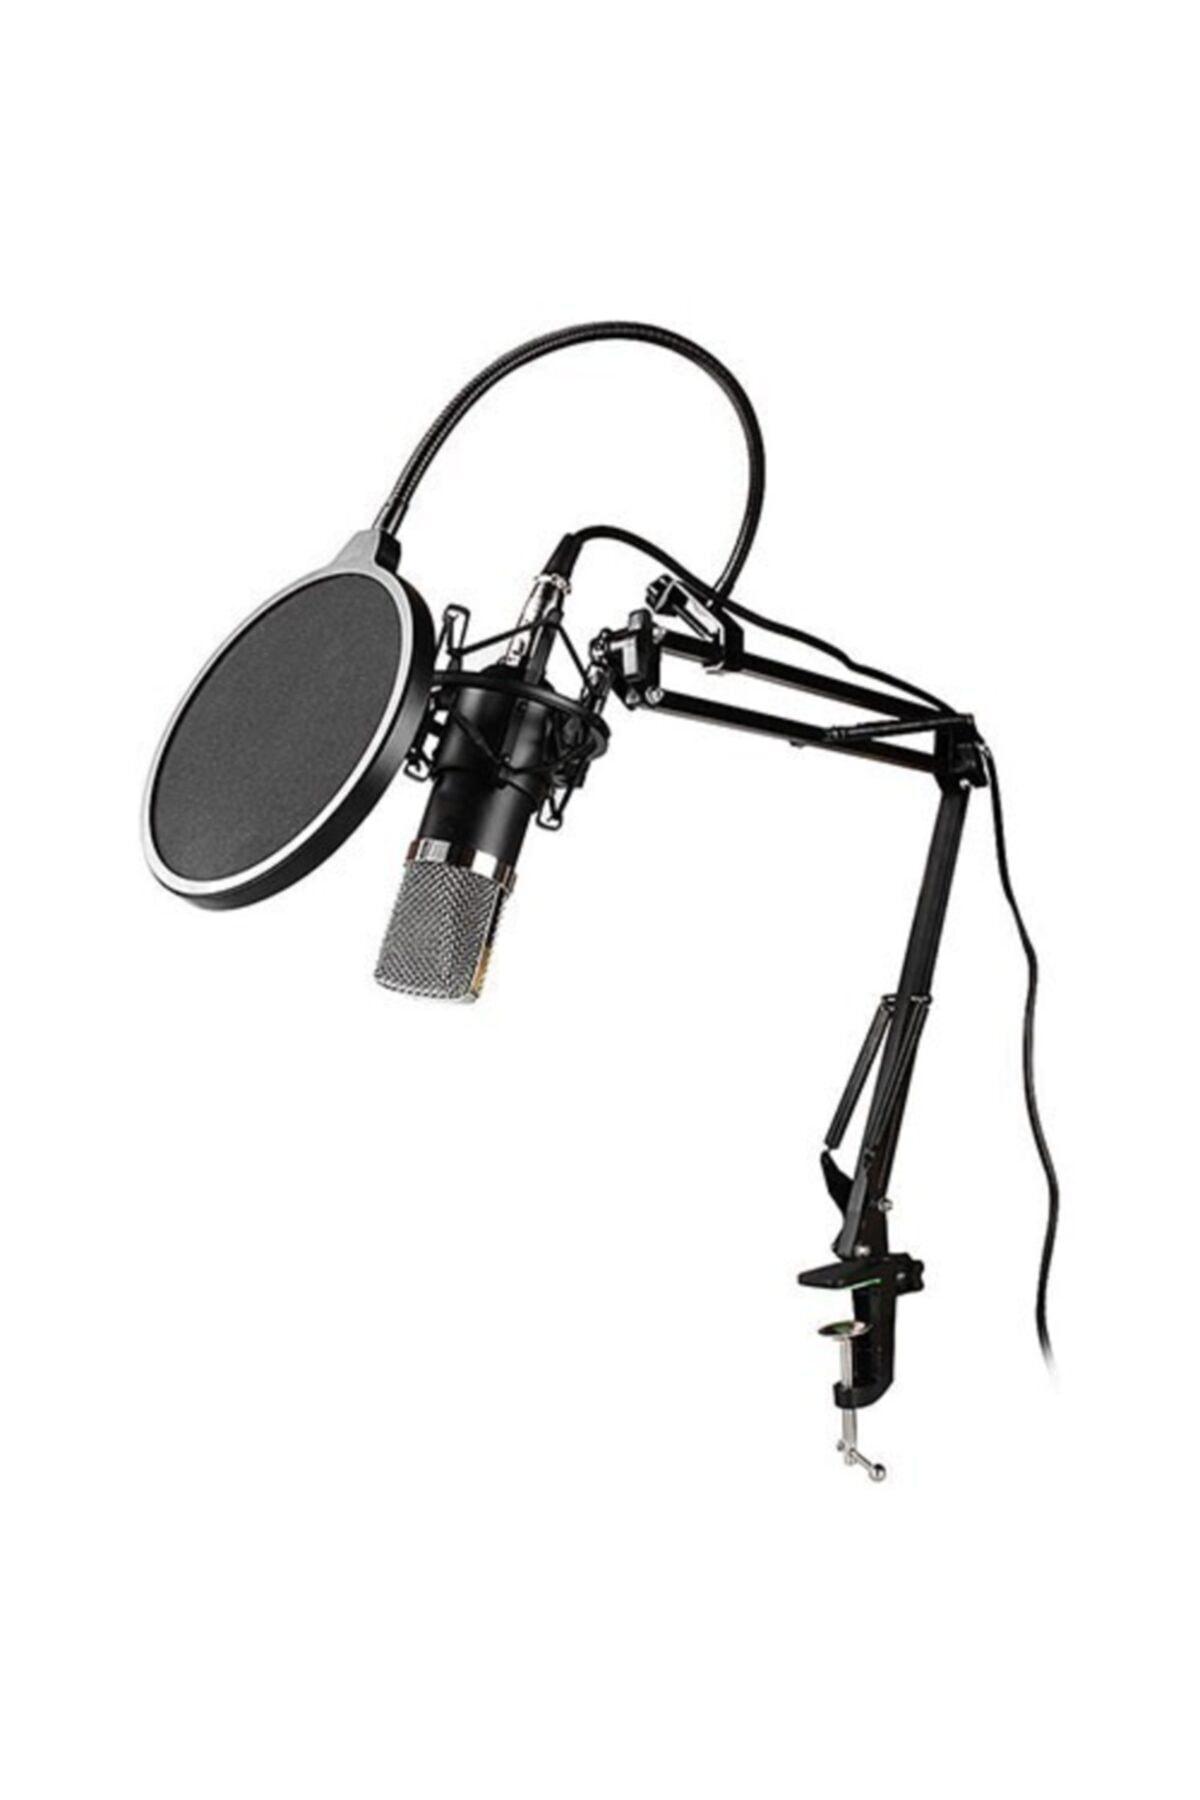 Snopy Sn-03p Profesyonel Stand Ve Filtreli Youtuber Ve Masaüstü Mikrofon 1